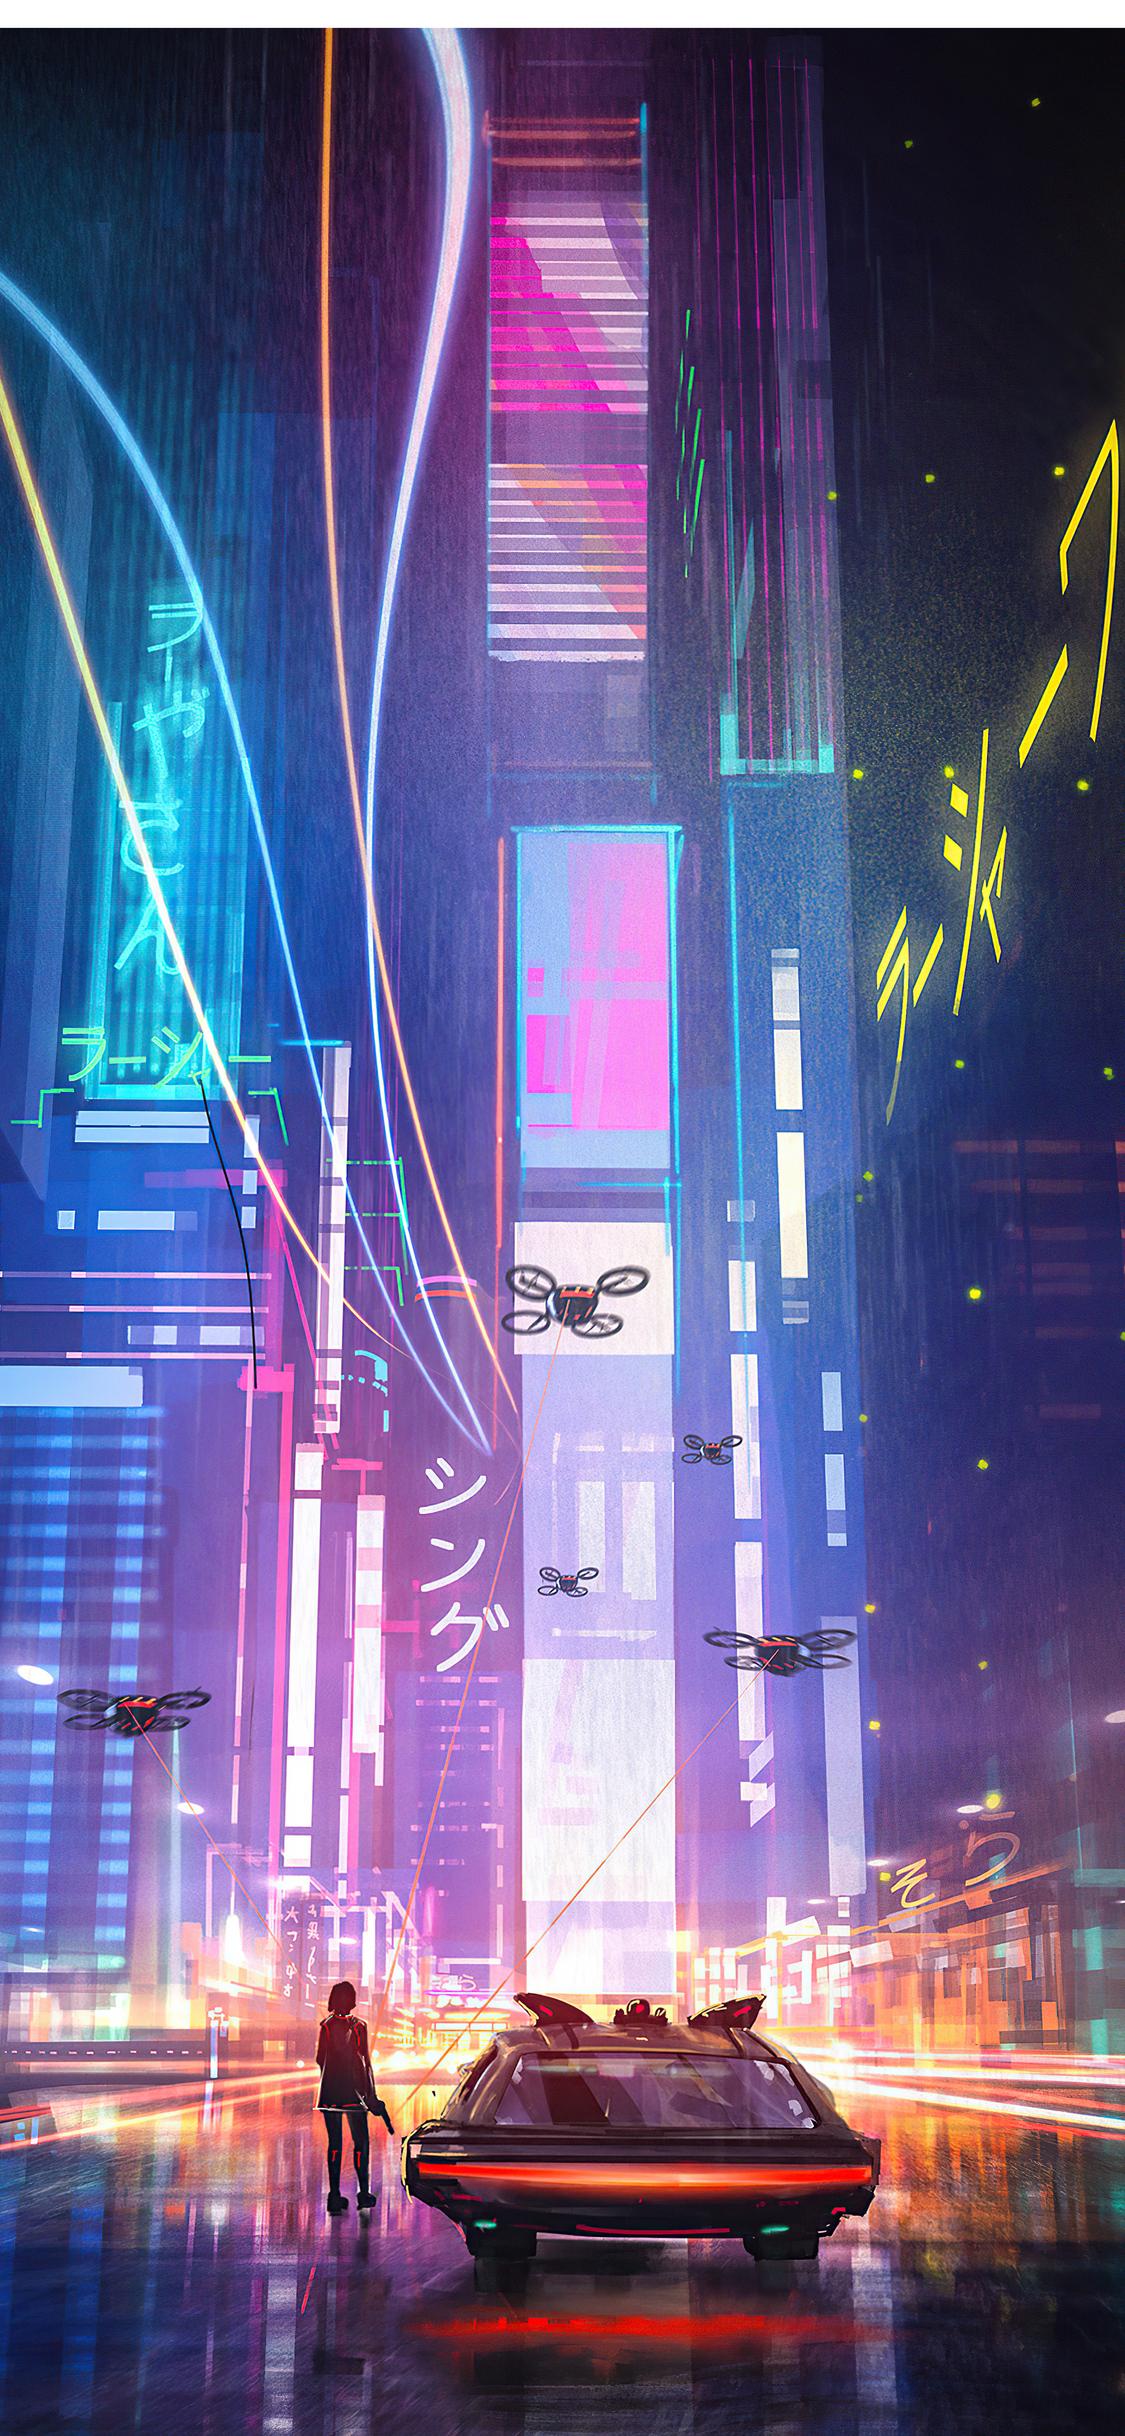 got-busted-cyberpunk-scifi-girl-4k-v1.jpg